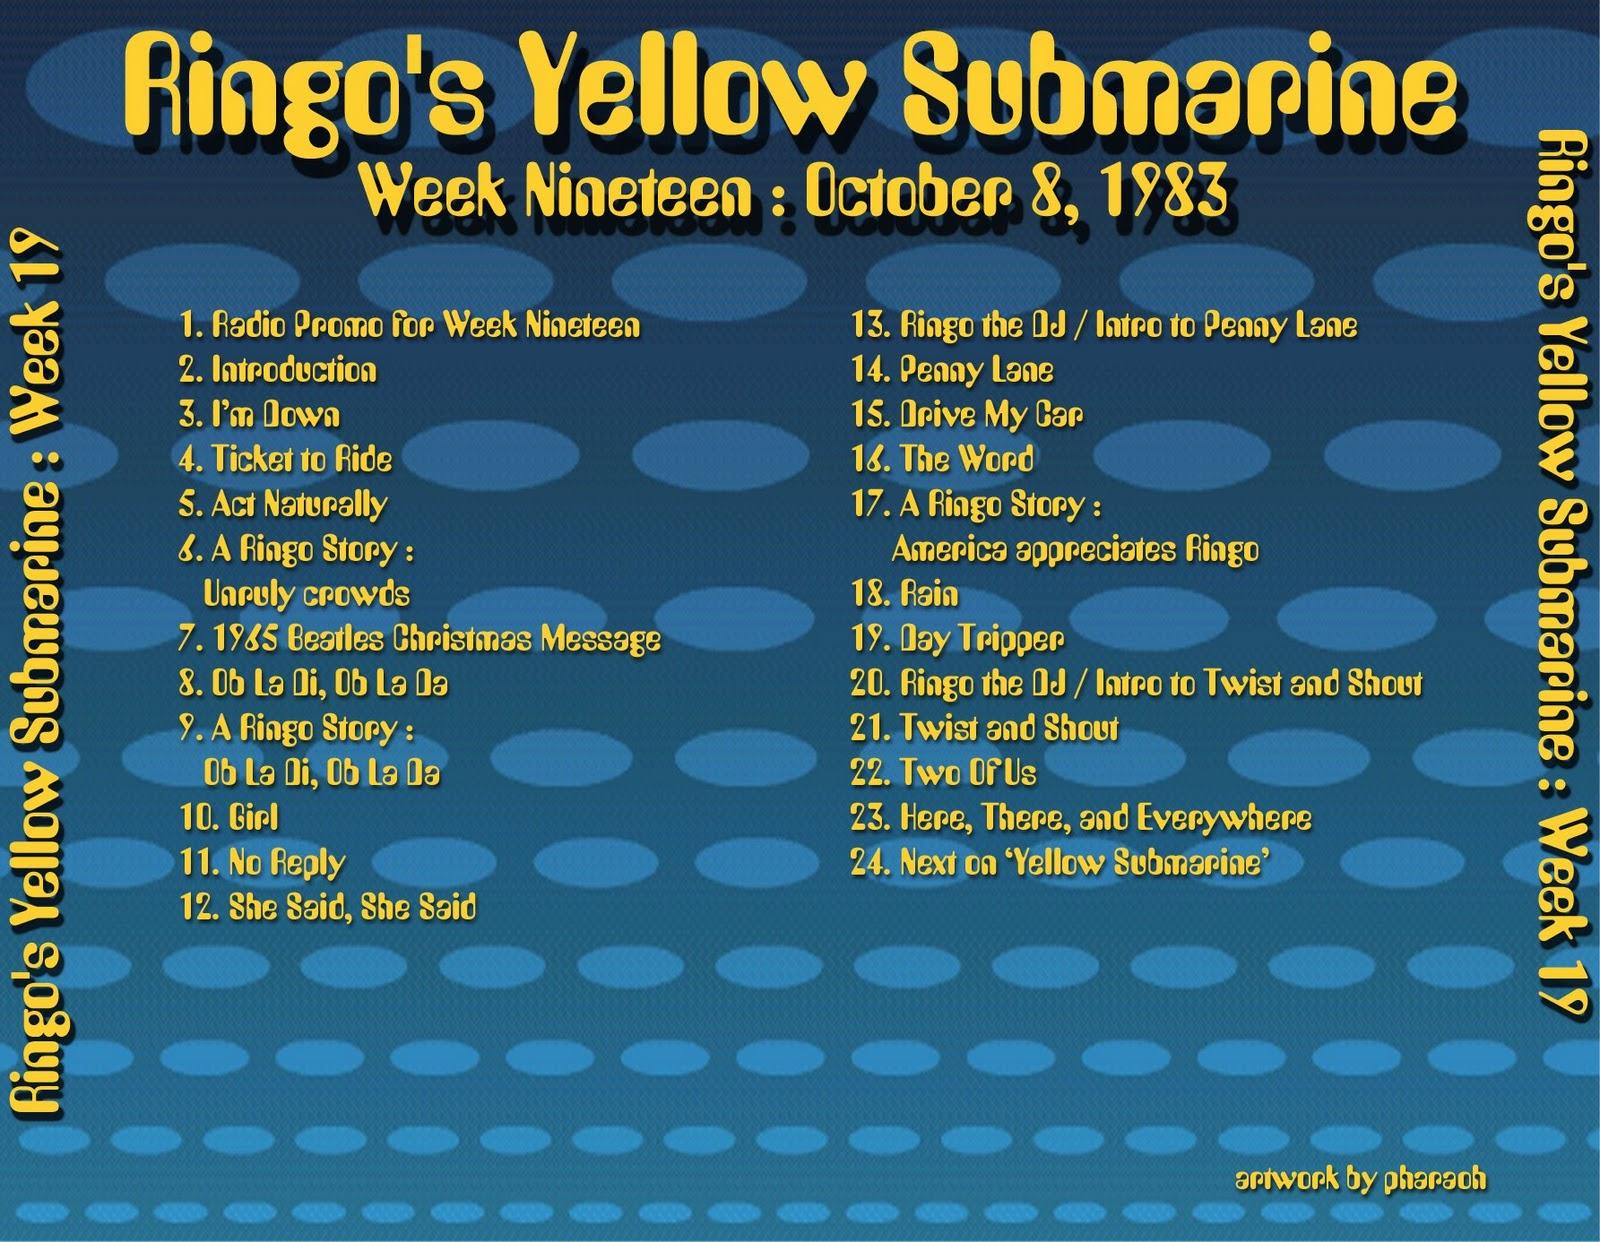 Beatles Radio Waves: 1983 10 08 Ringo's Yellow Submarine 19 #BA9B11 1600 1242